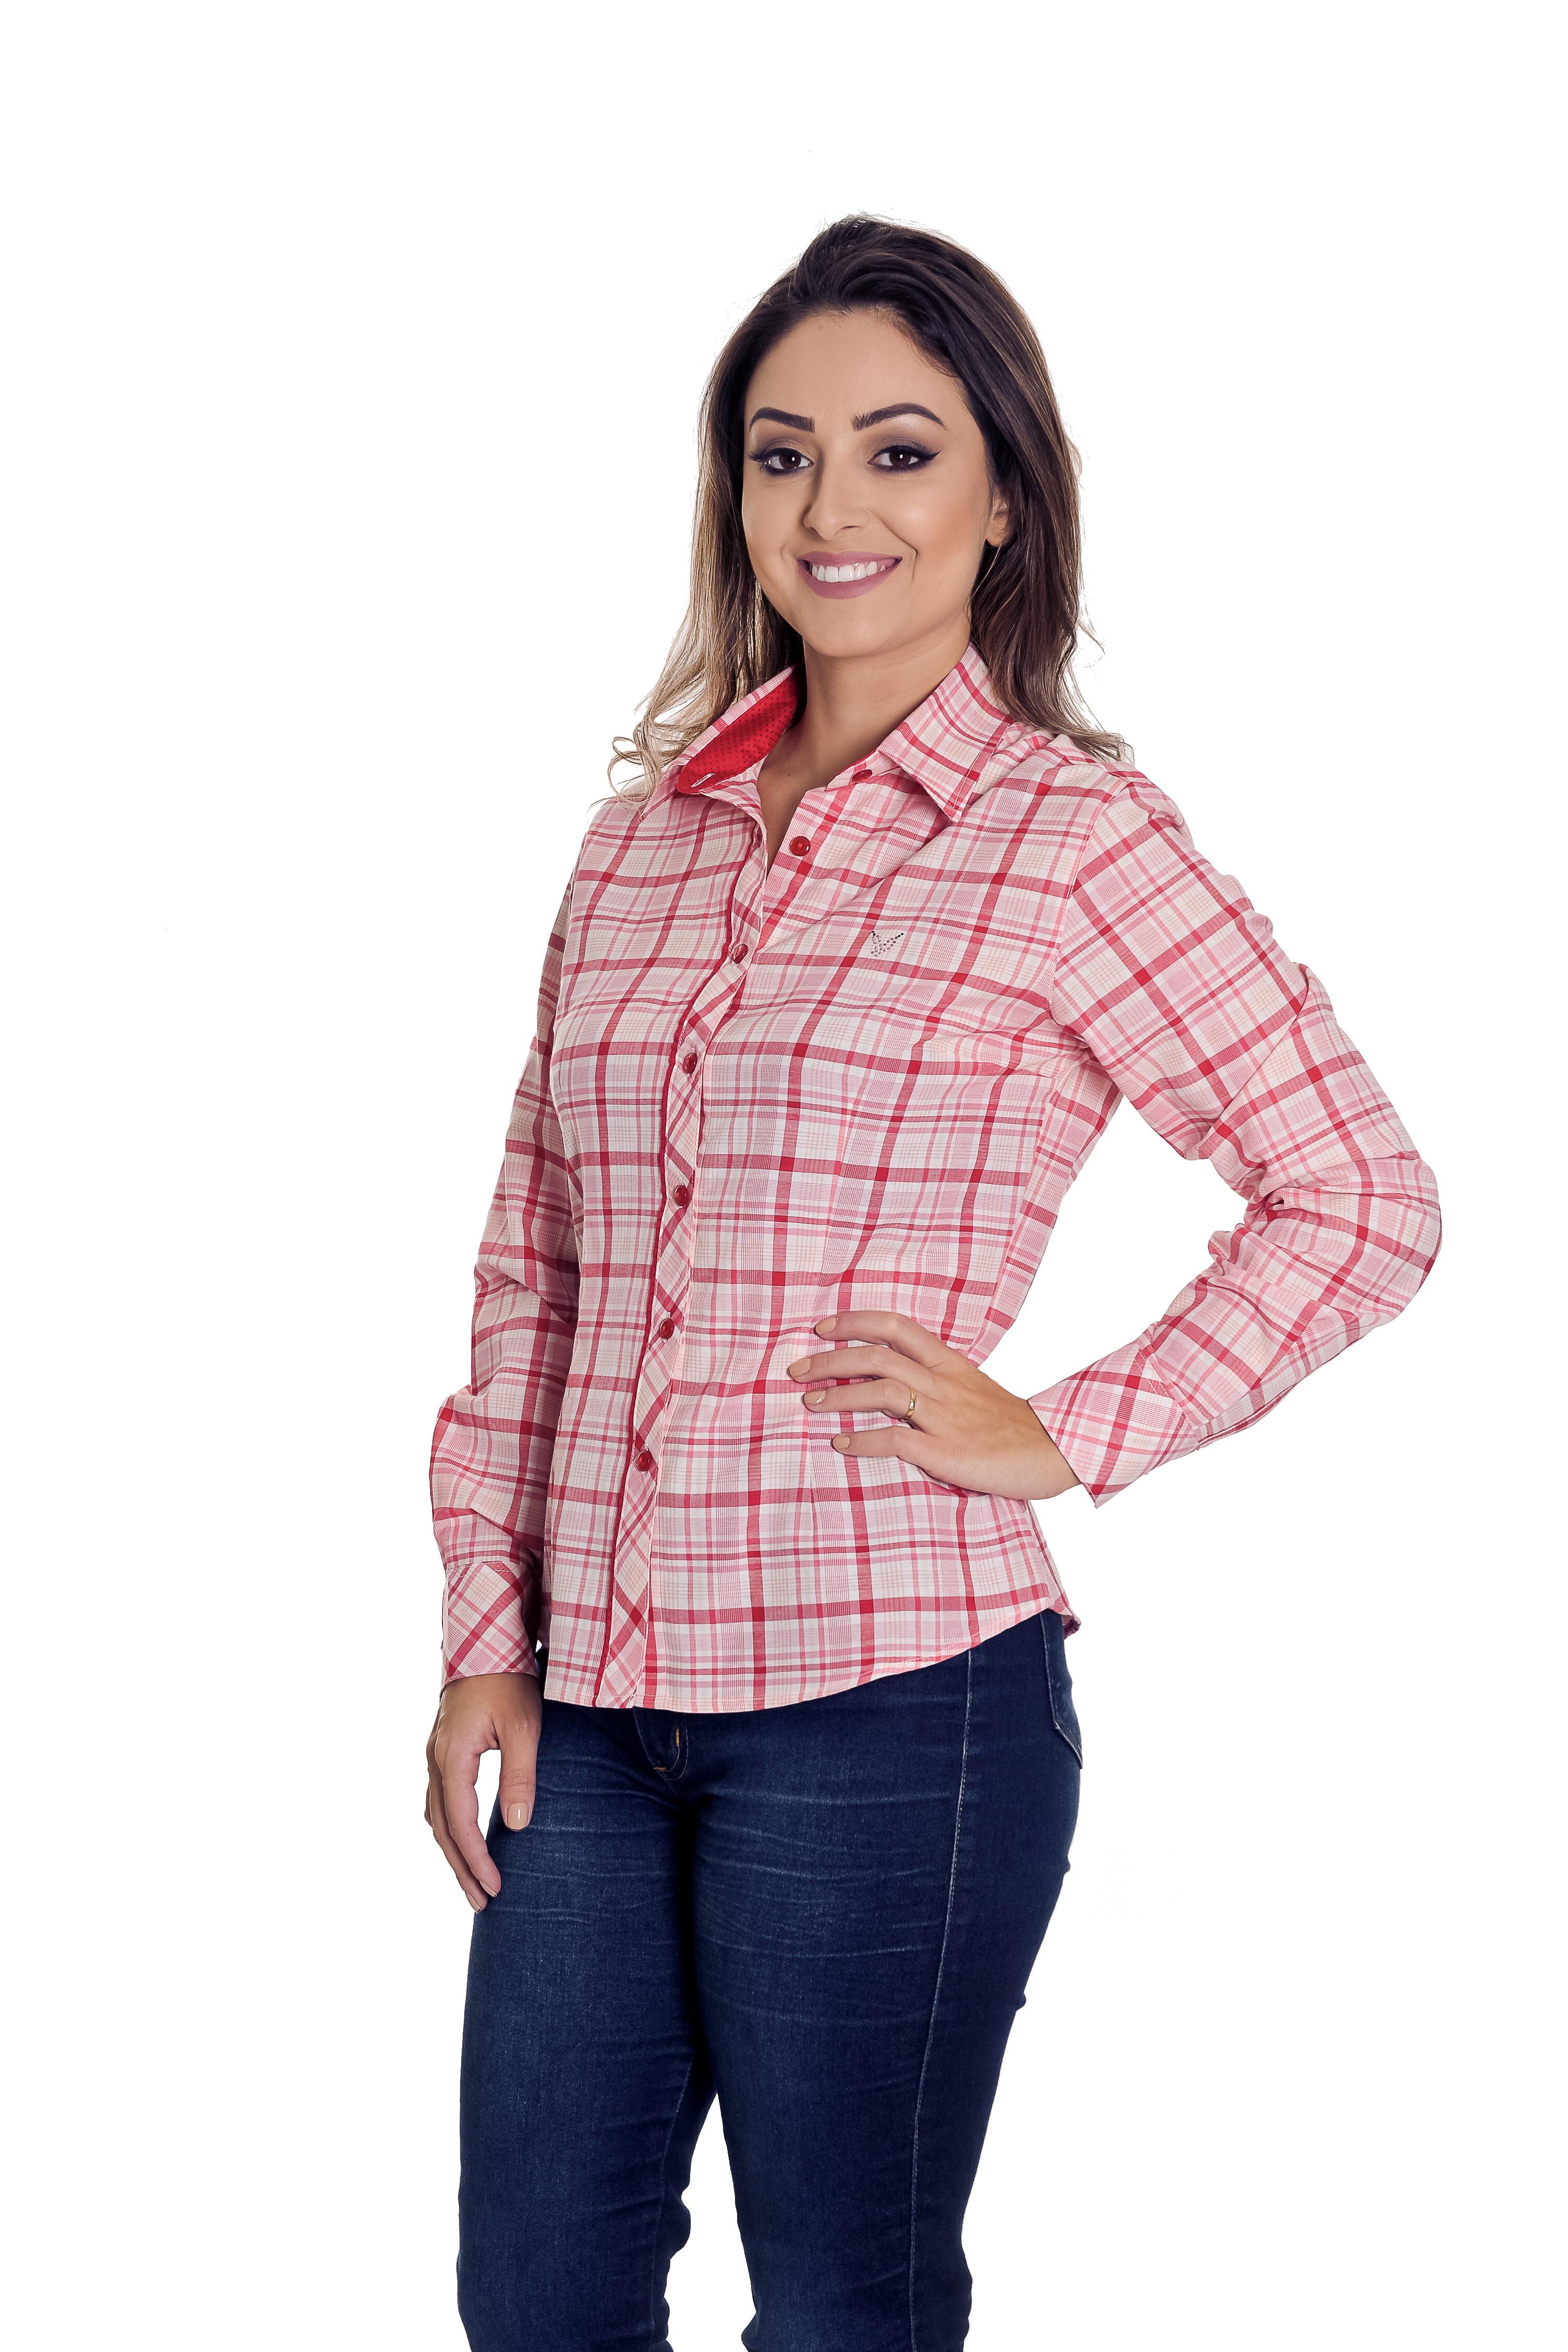 b85cb27ef Camisa Social Xadrez Feminina Beatriz - Pimenta Rosada no Elo7 ...